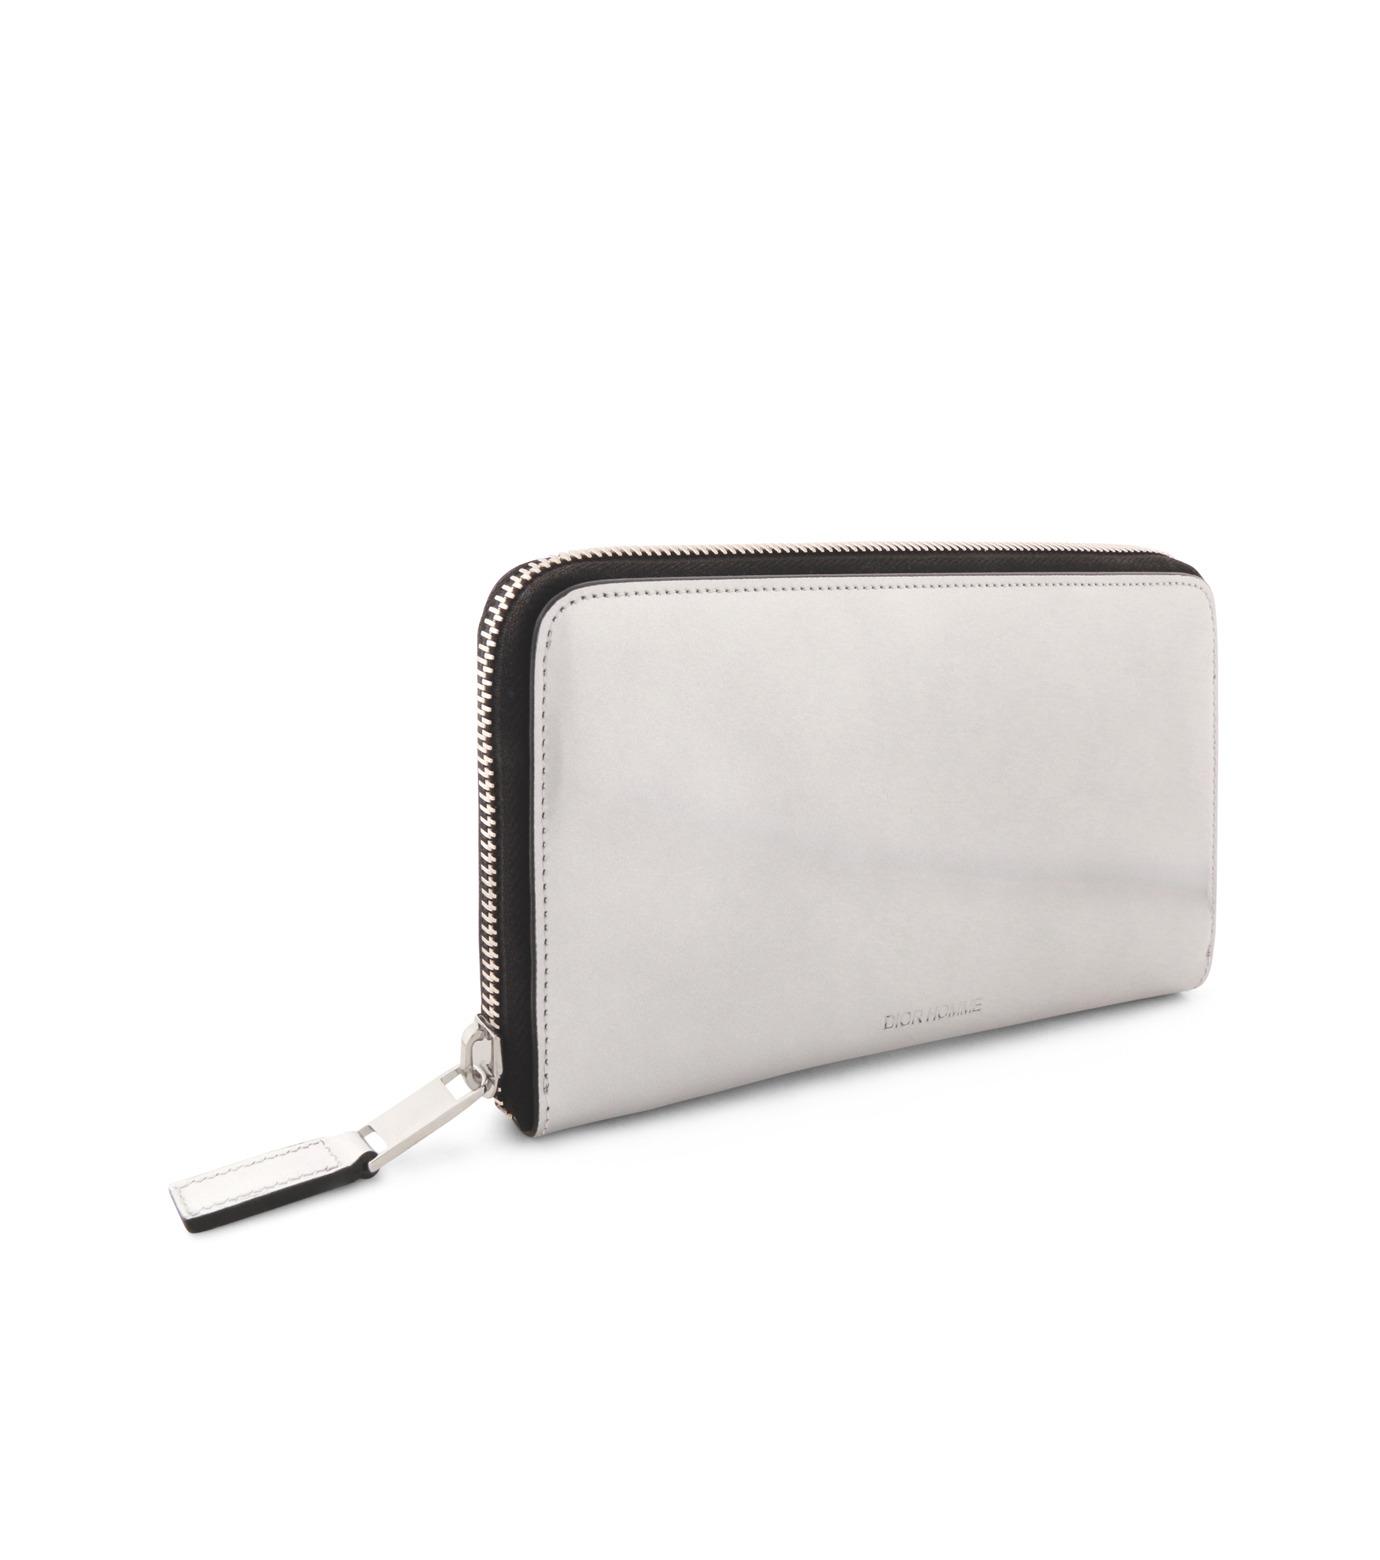 Dior Homme(ディオール オム)のSilver Wallet-SILVER-2DEBC011XJD-1 拡大詳細画像2